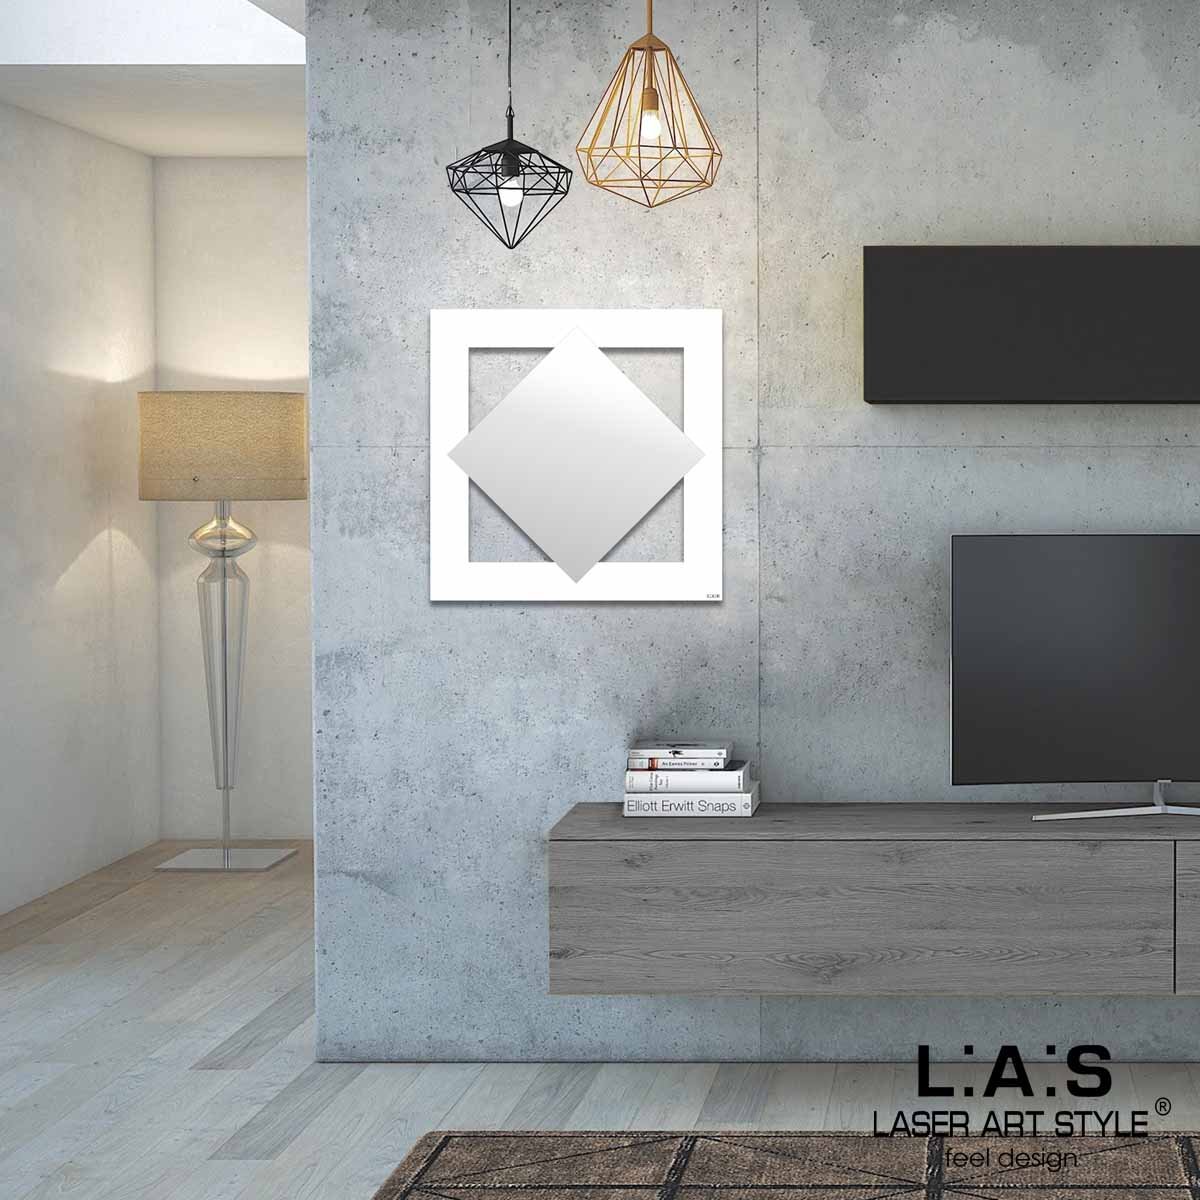 L:A:S - Laser Art Style - SPECCHIO DA PARETE MINIMAL Q-SP BIANCO